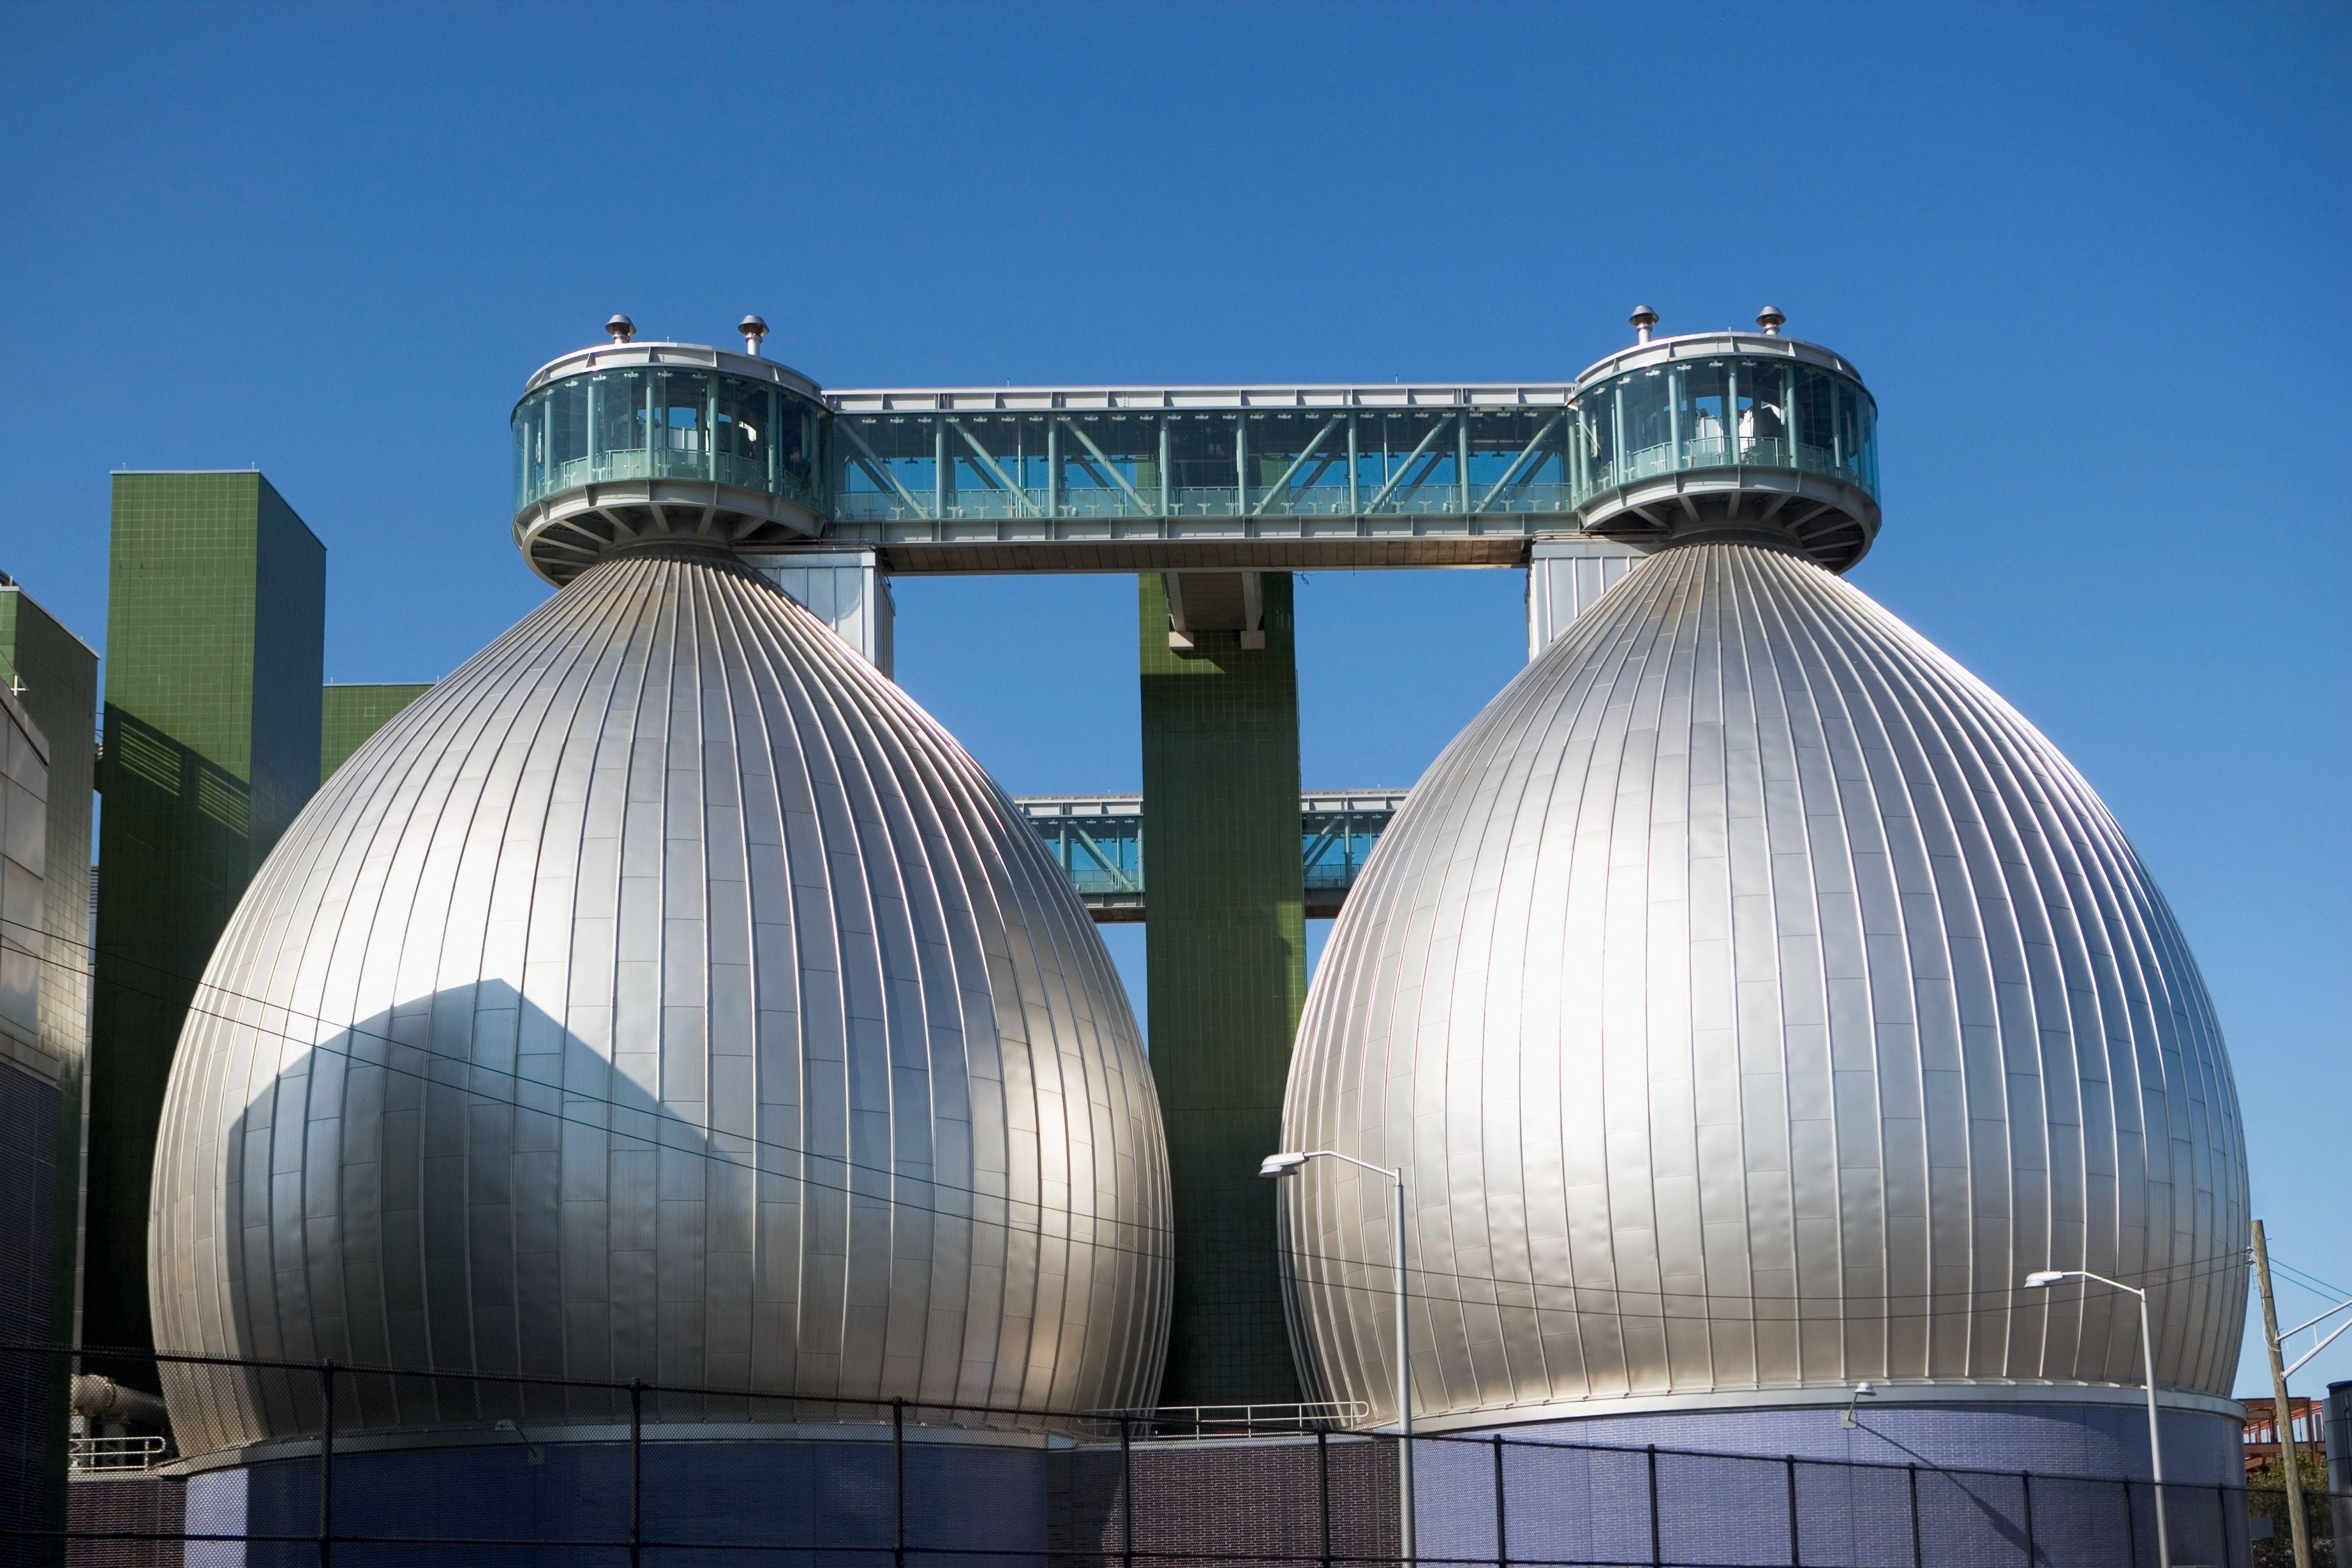 Newtown Creek Wastewater Treatment Plant, New York